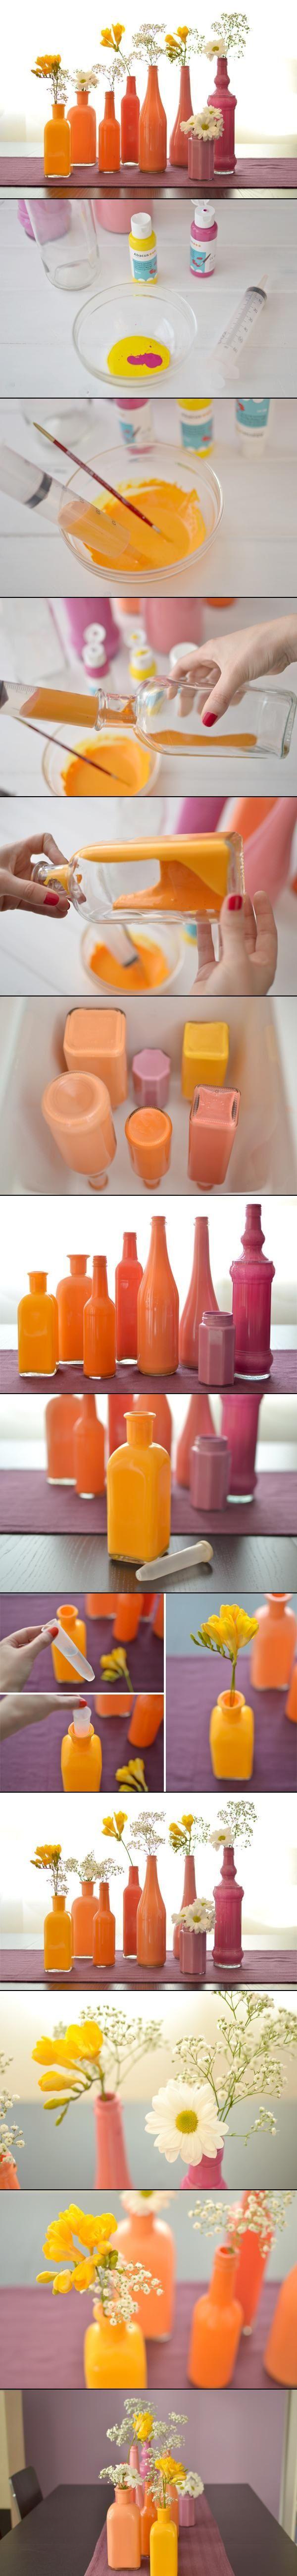 #paintedbottles #decorations #diybottle #crafts #doityourself #paint #bottle #diybazaar